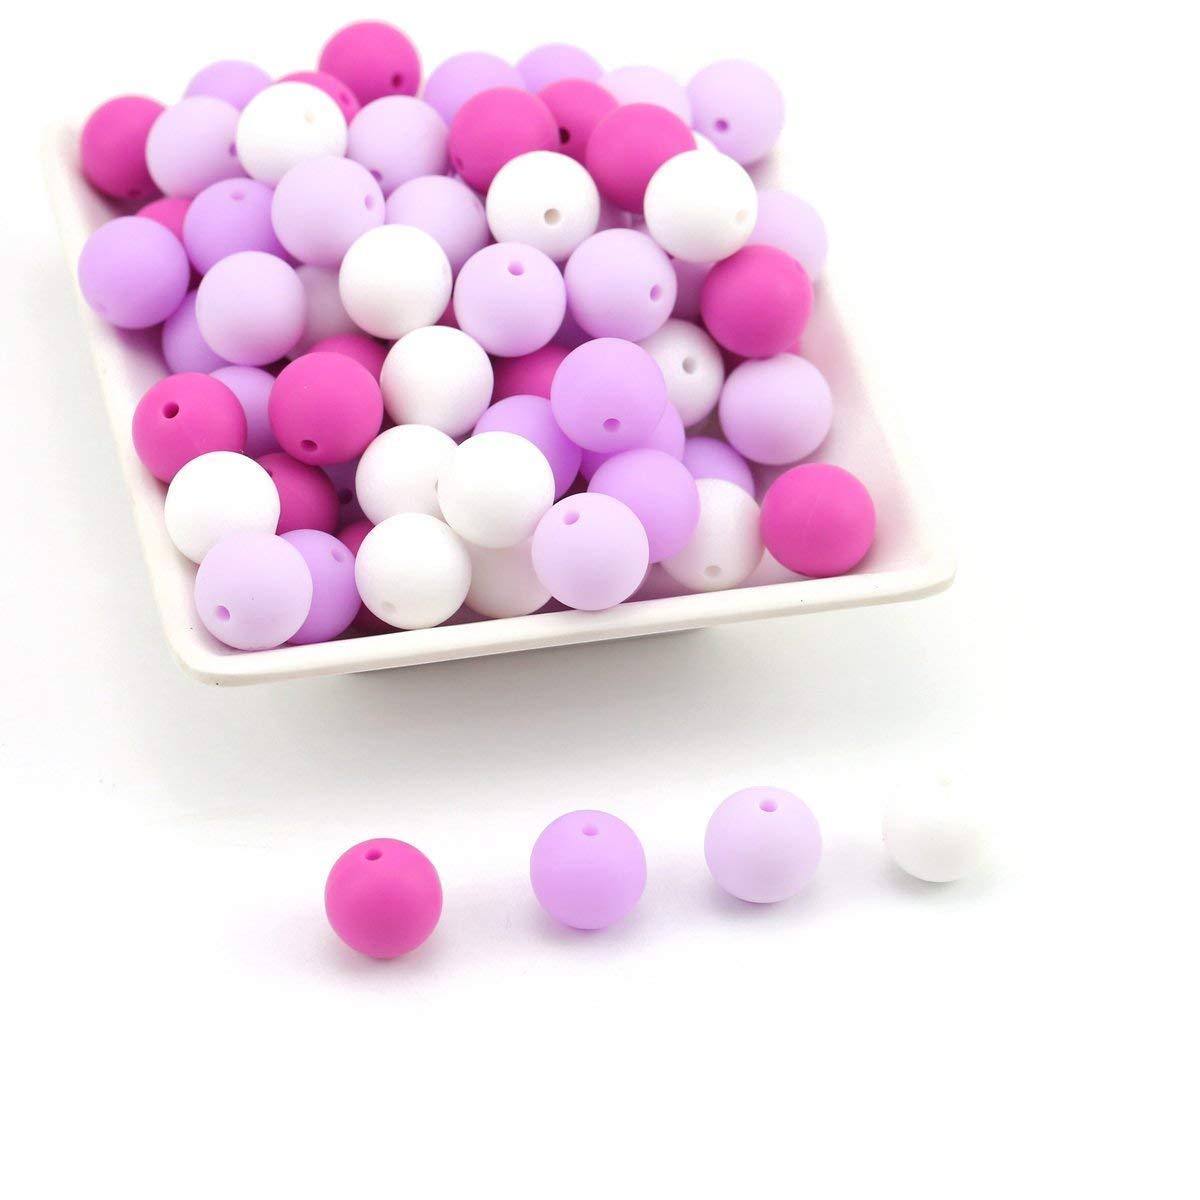 Mamimami Home Bei/ßring Silikon Perlen 15mm 50pc DIY Clips Schnullerkette Halskette Zahnen Babyarmband Montessori Baby Teething Beads